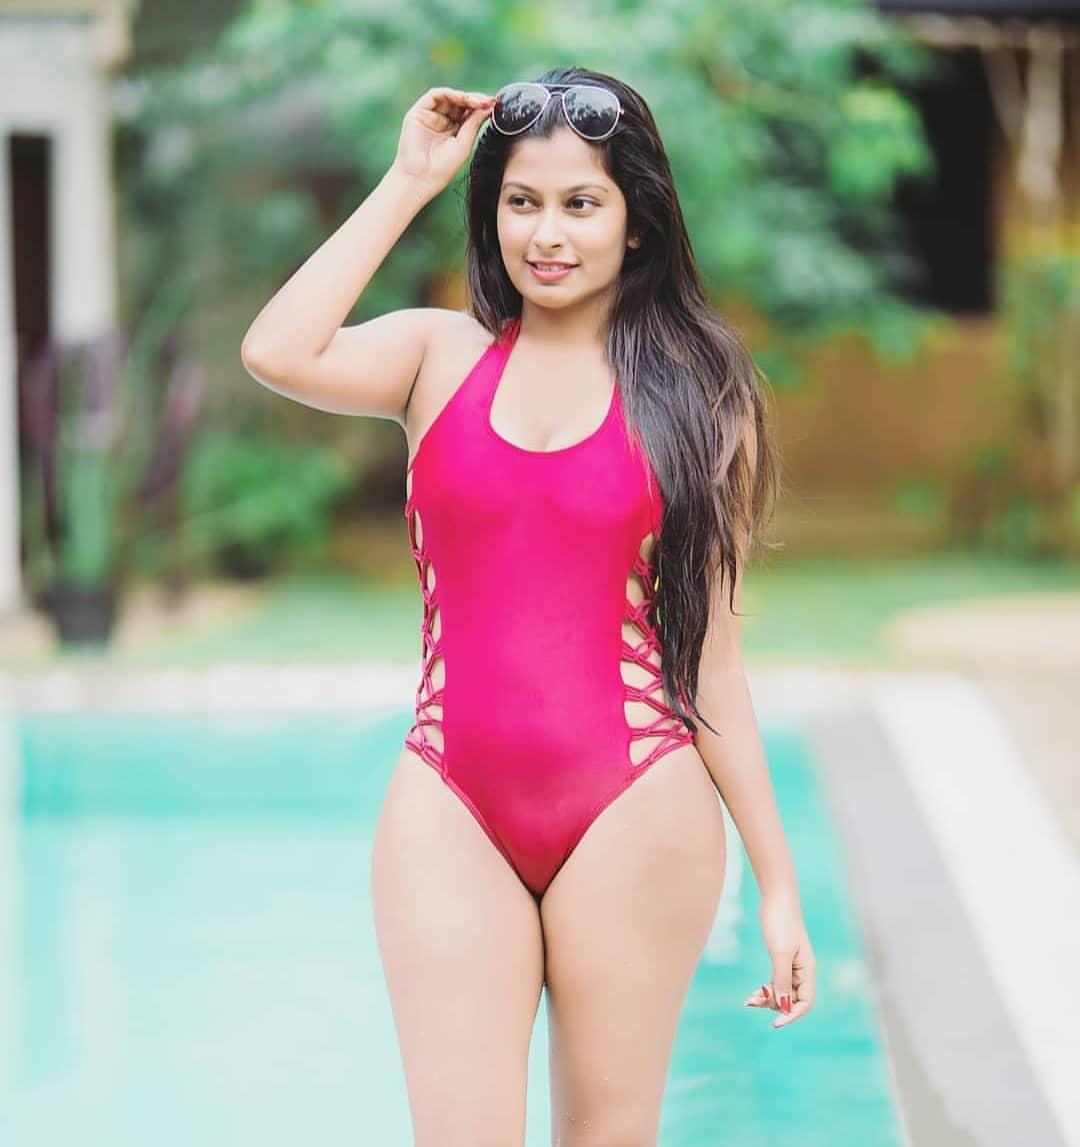 Sri Lanka Sex Photo - TrendLK | Latest Sri Lankan Trends